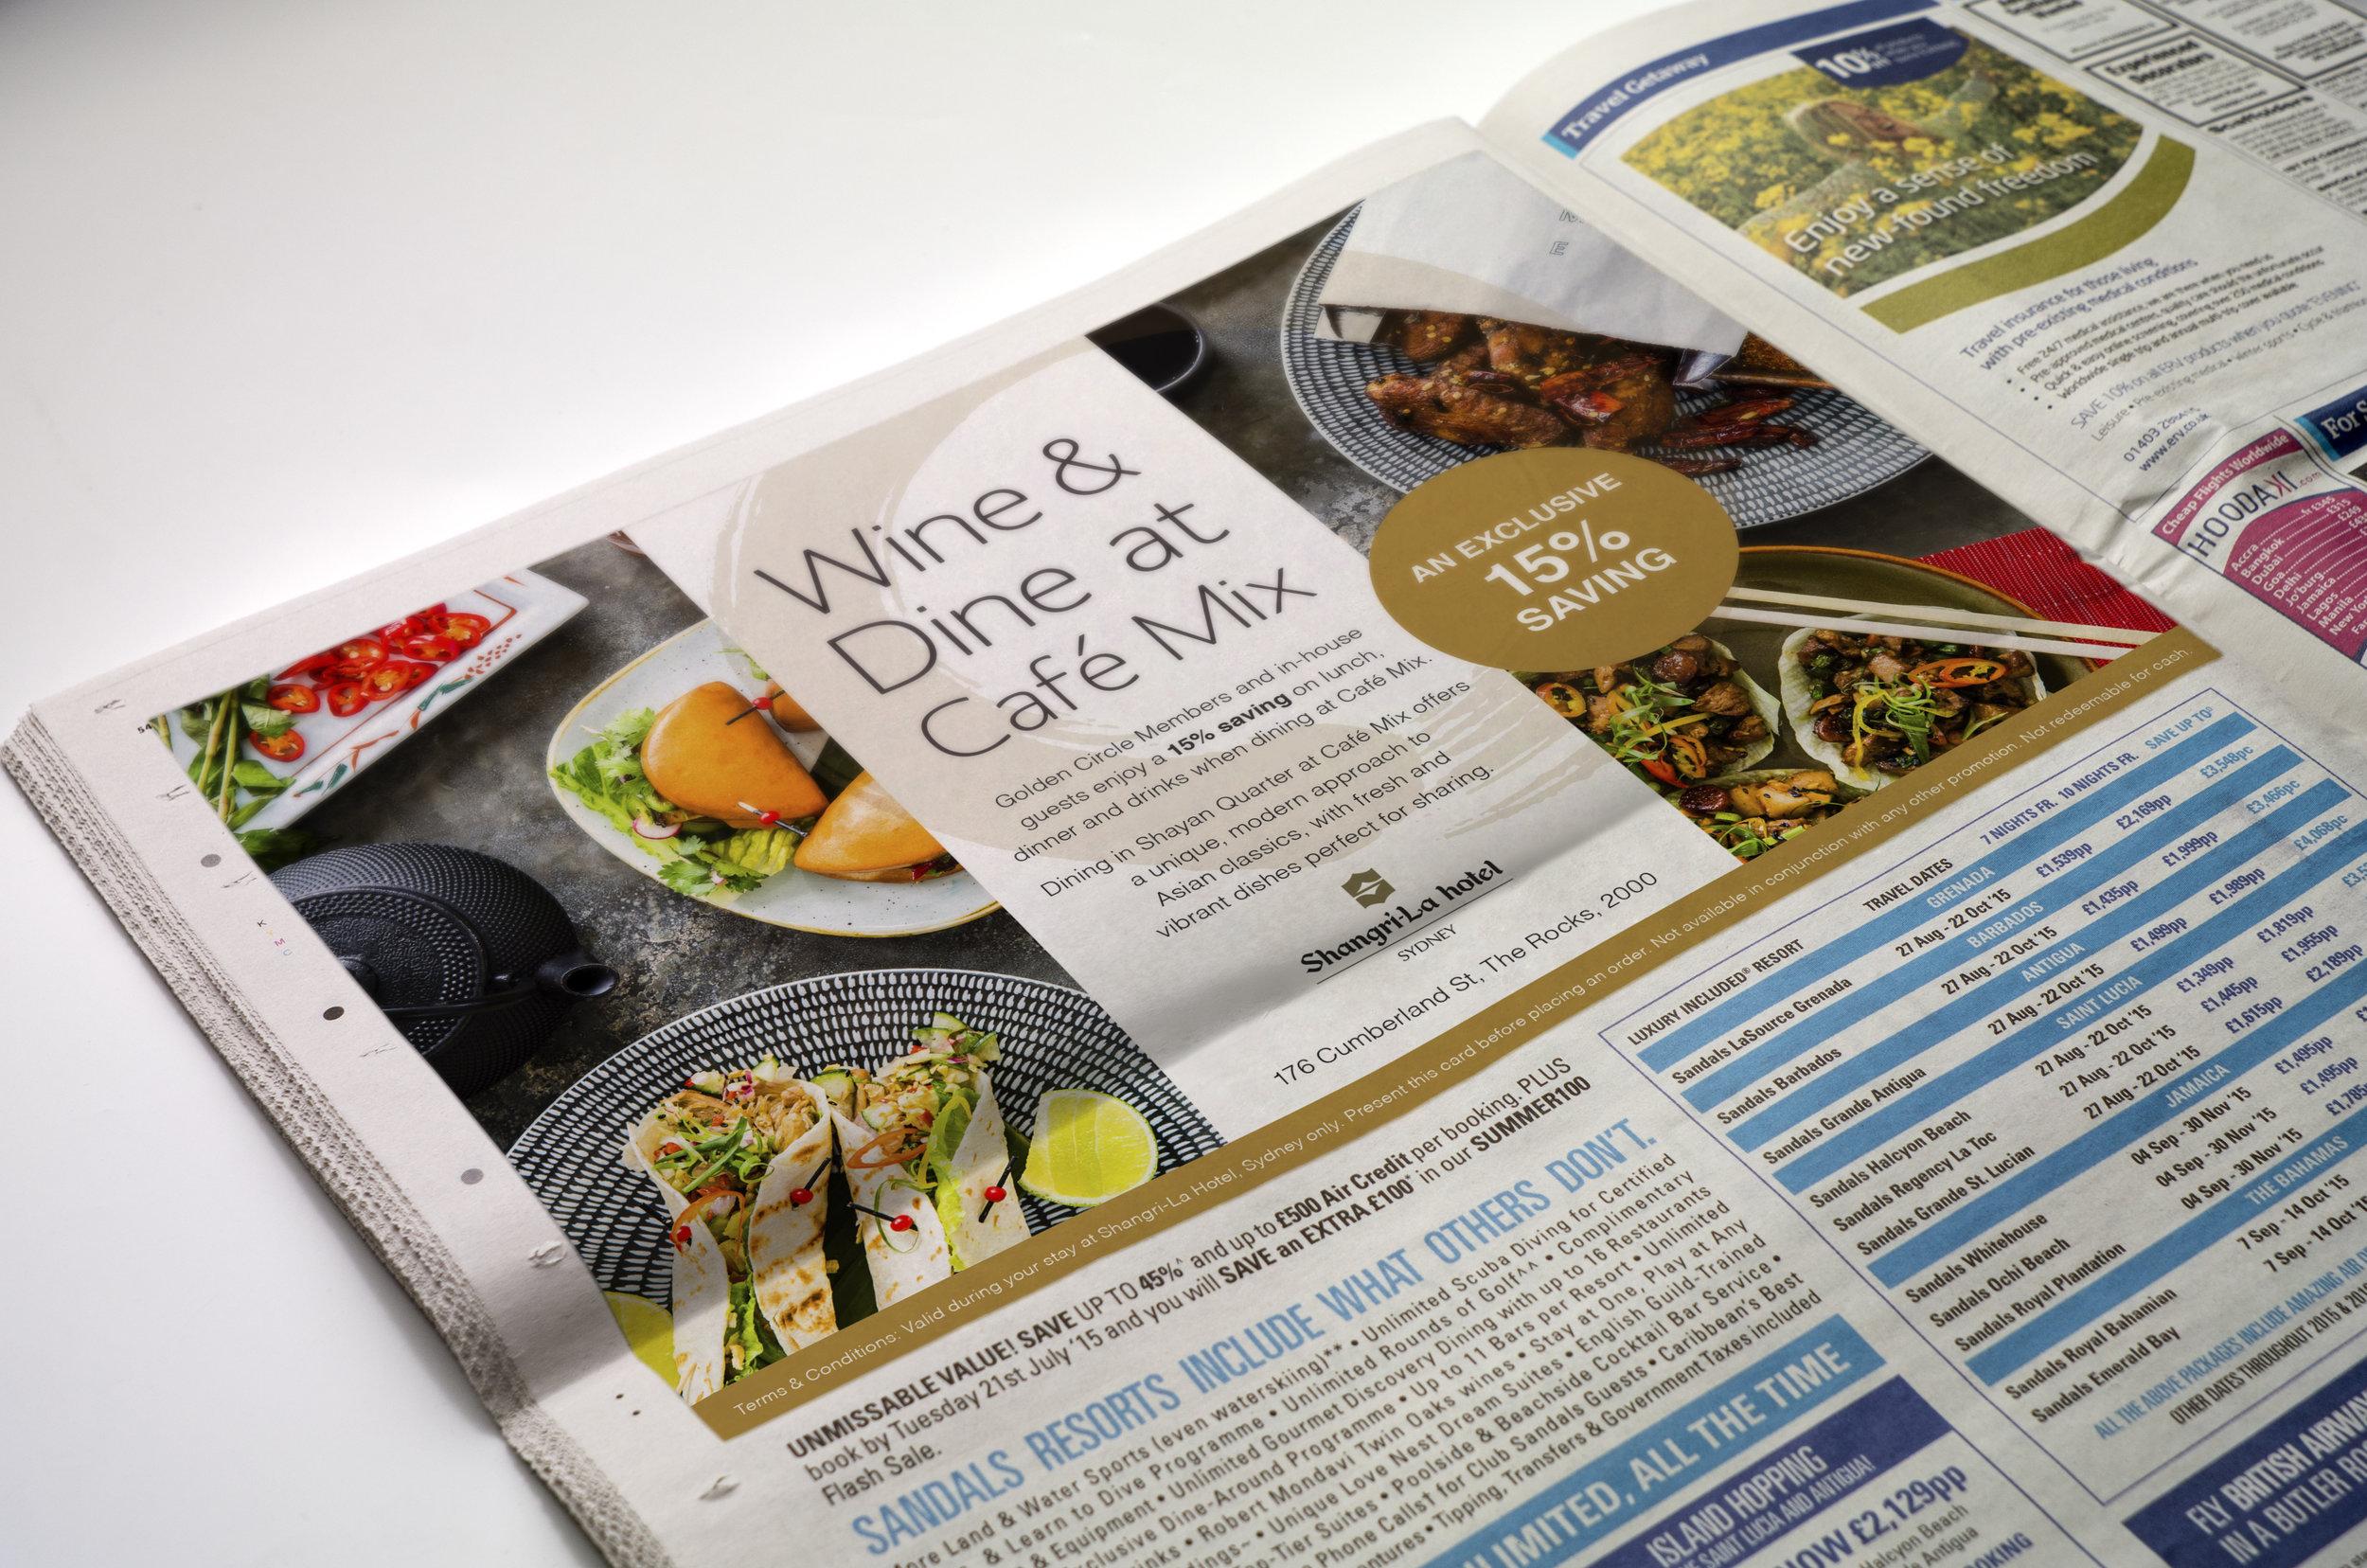 Newspaper_ad_SRSL Cafe mix.jpg